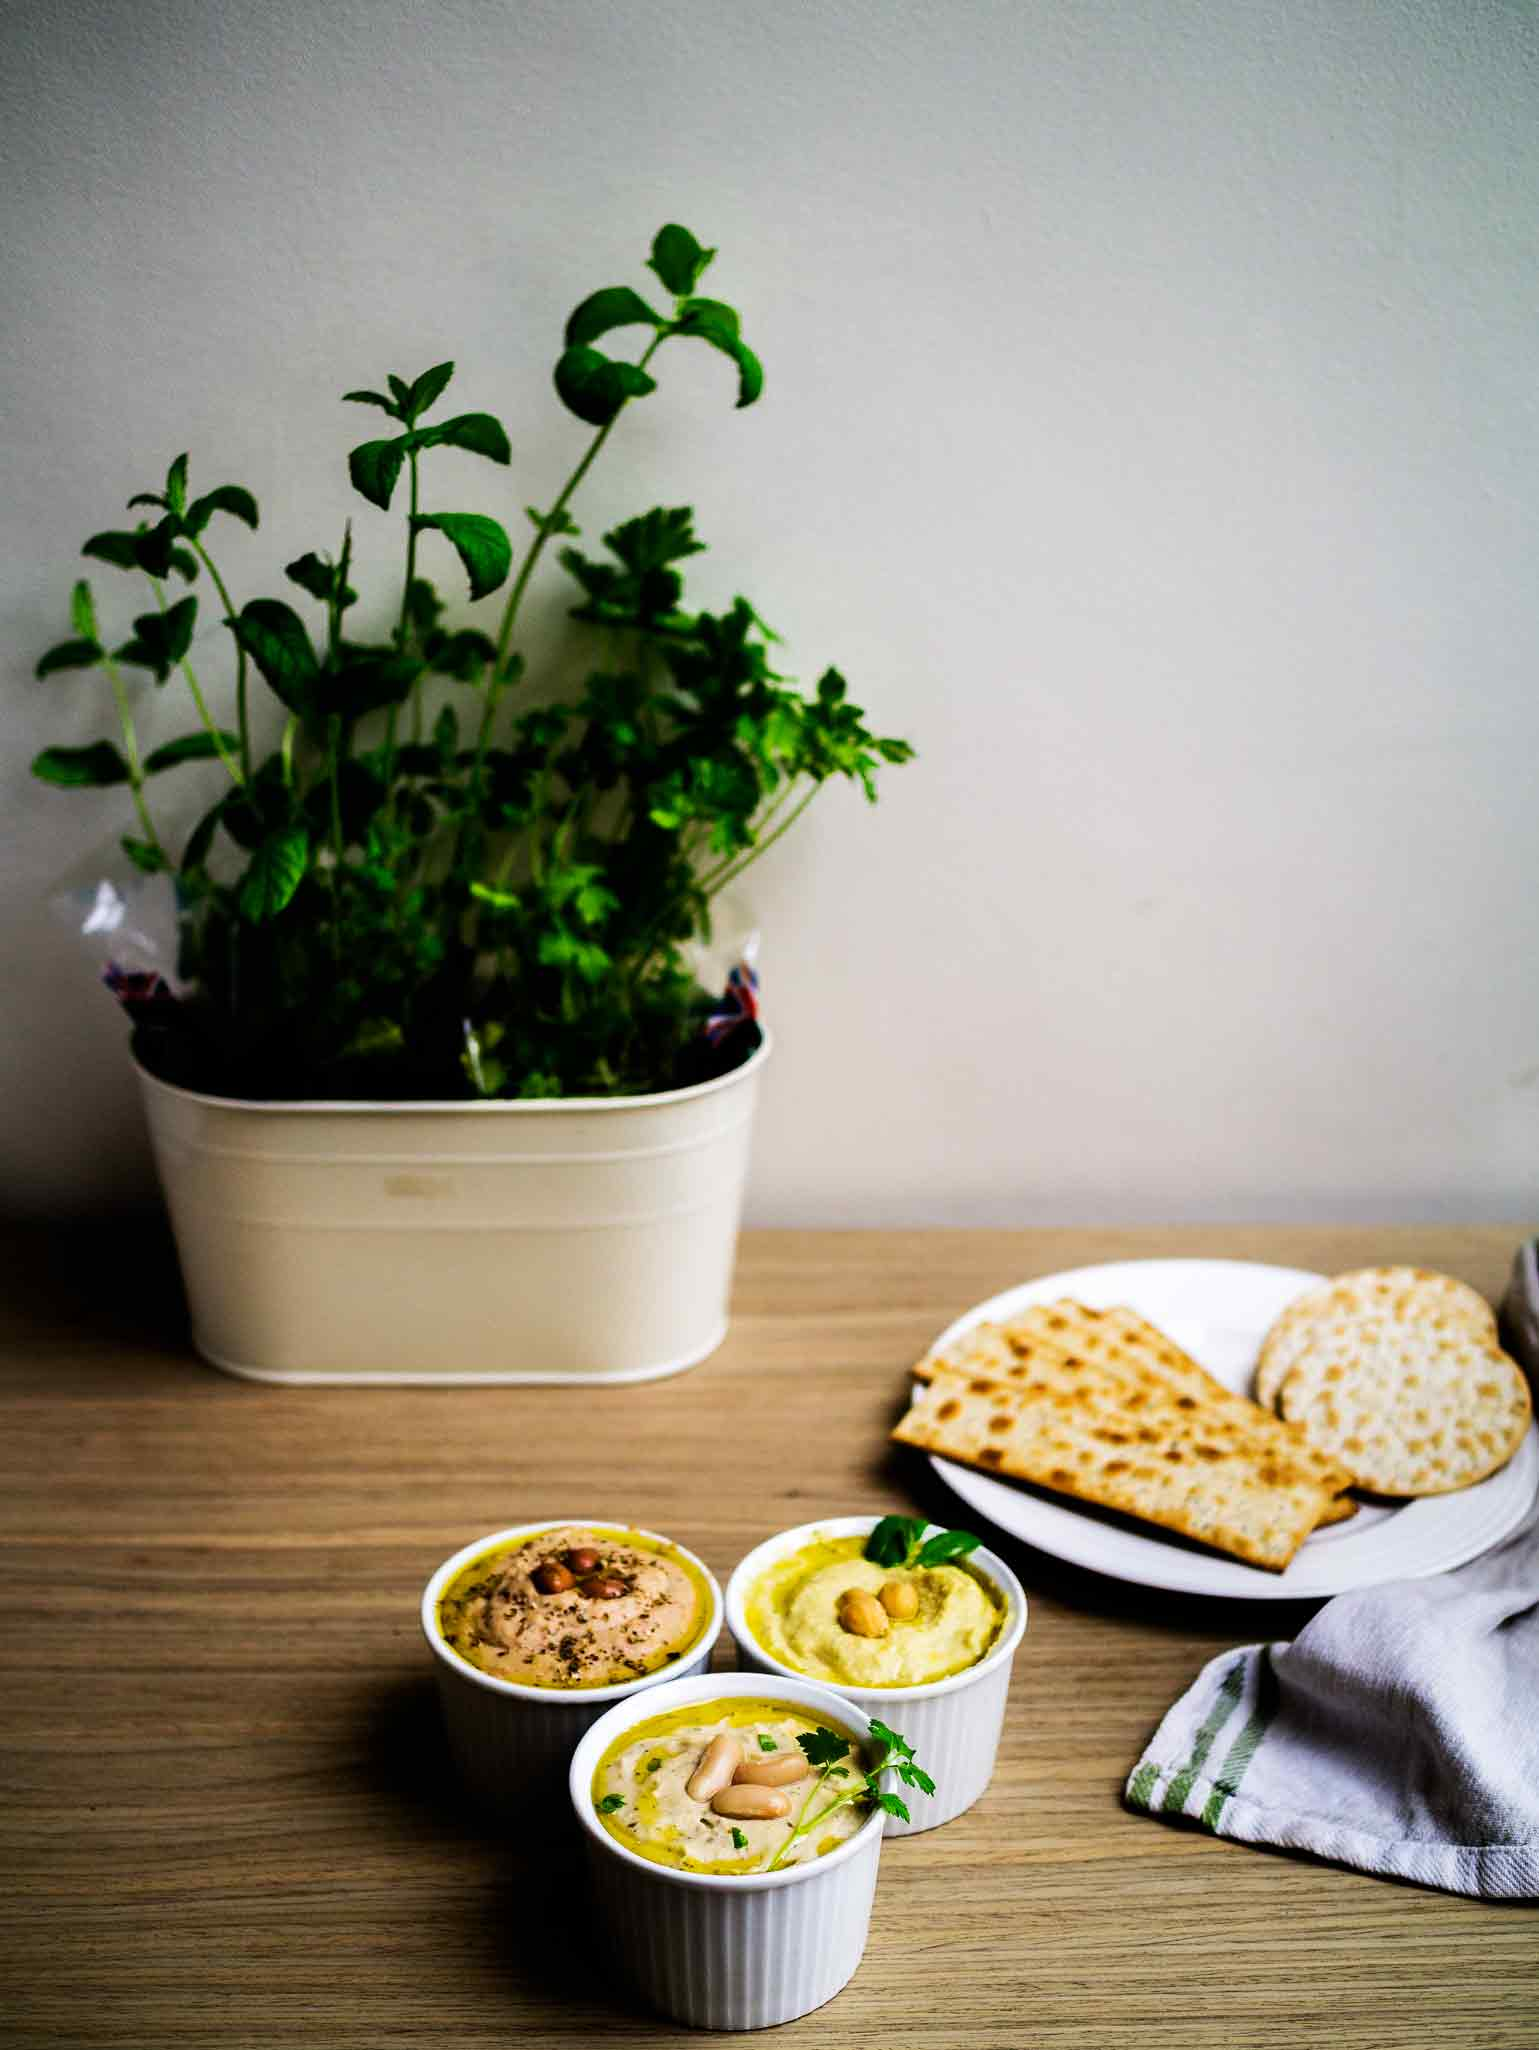 Adaptable Mediterranean Dip | www.discoverdelicious.org | Vegan Food Blog